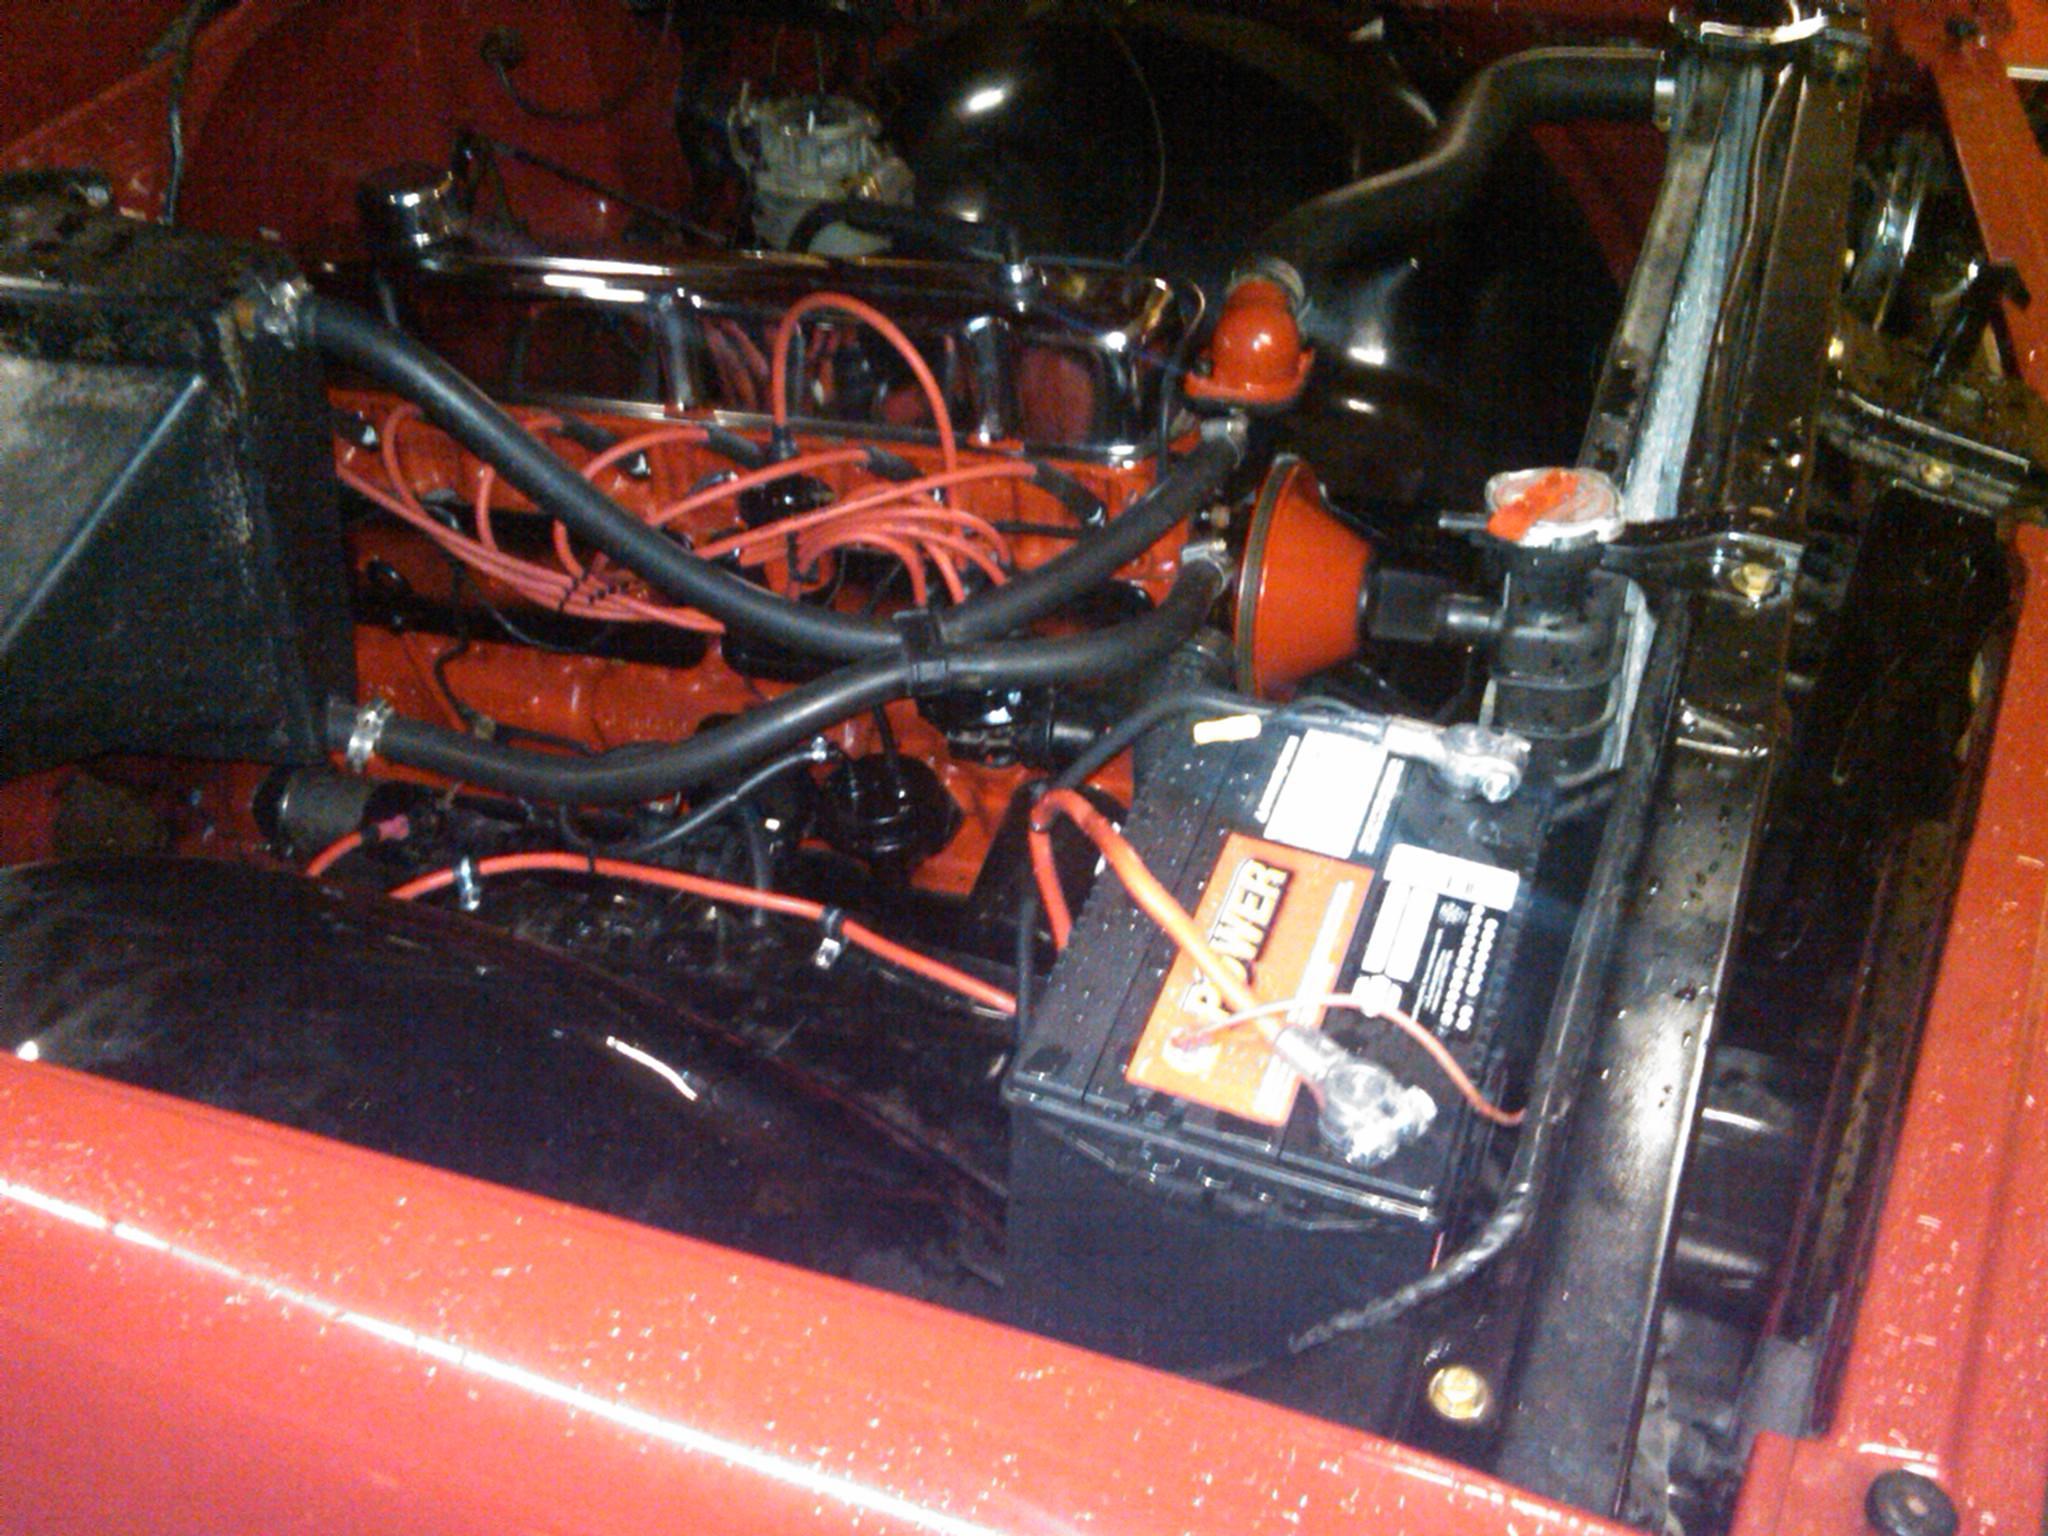 Ritter's Automotive